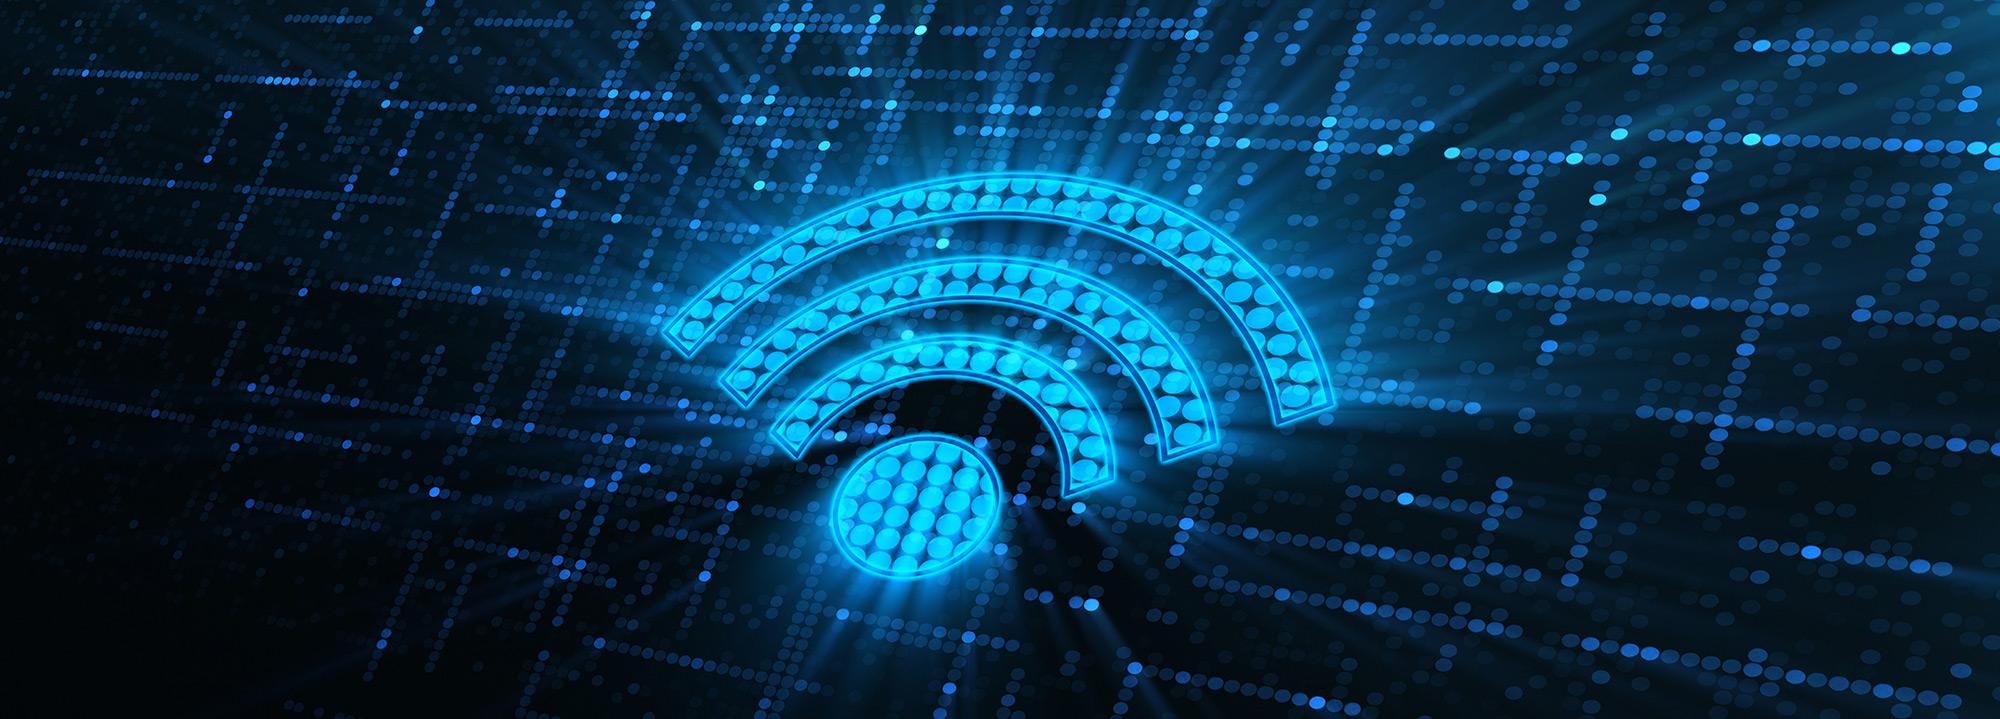 Borderless Network Systems